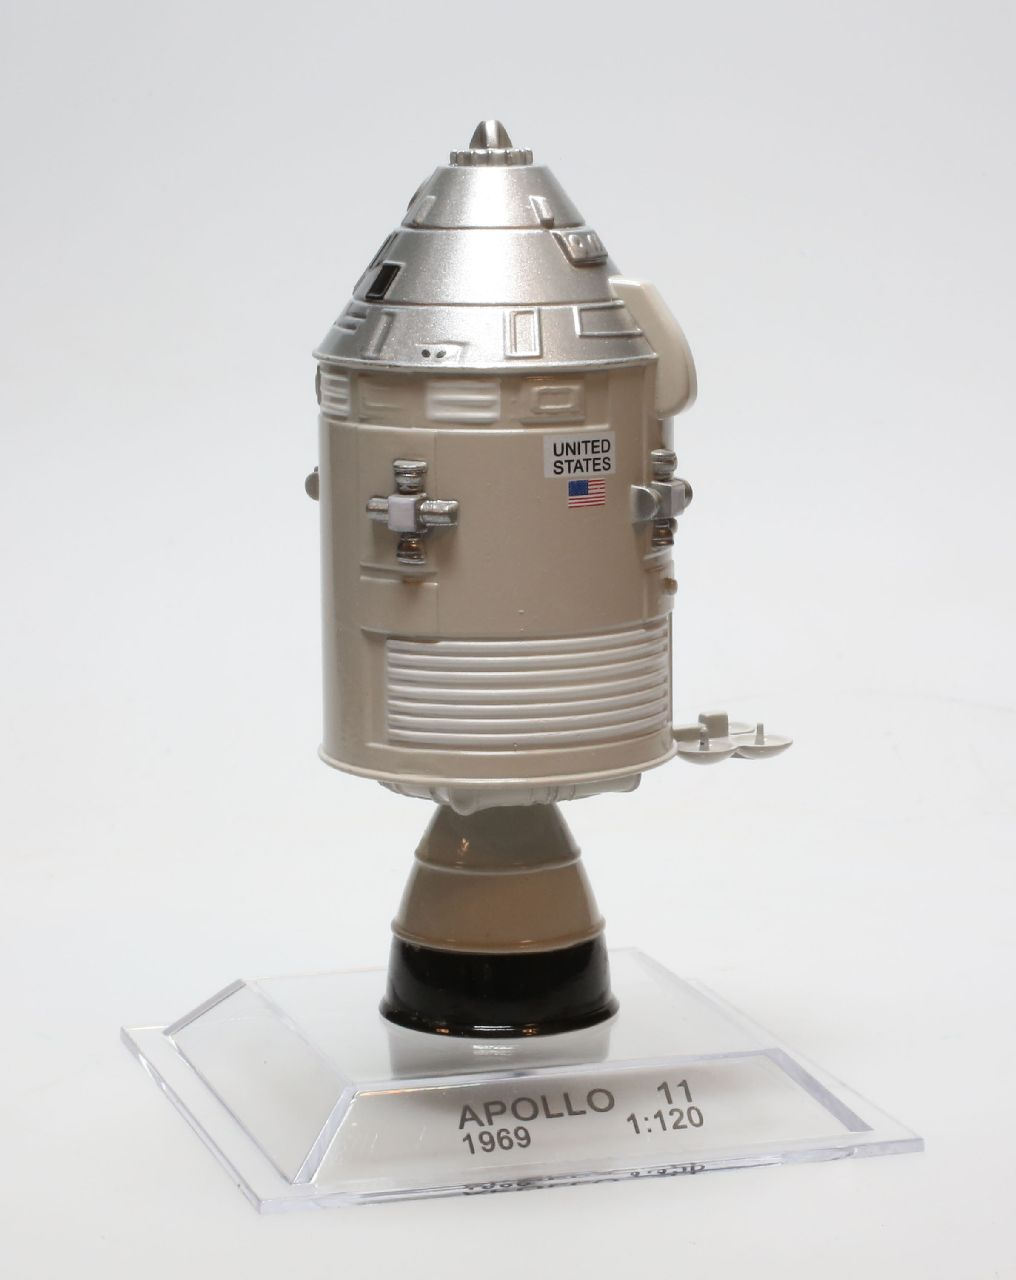 apollo 11 space shuttle - photo #42